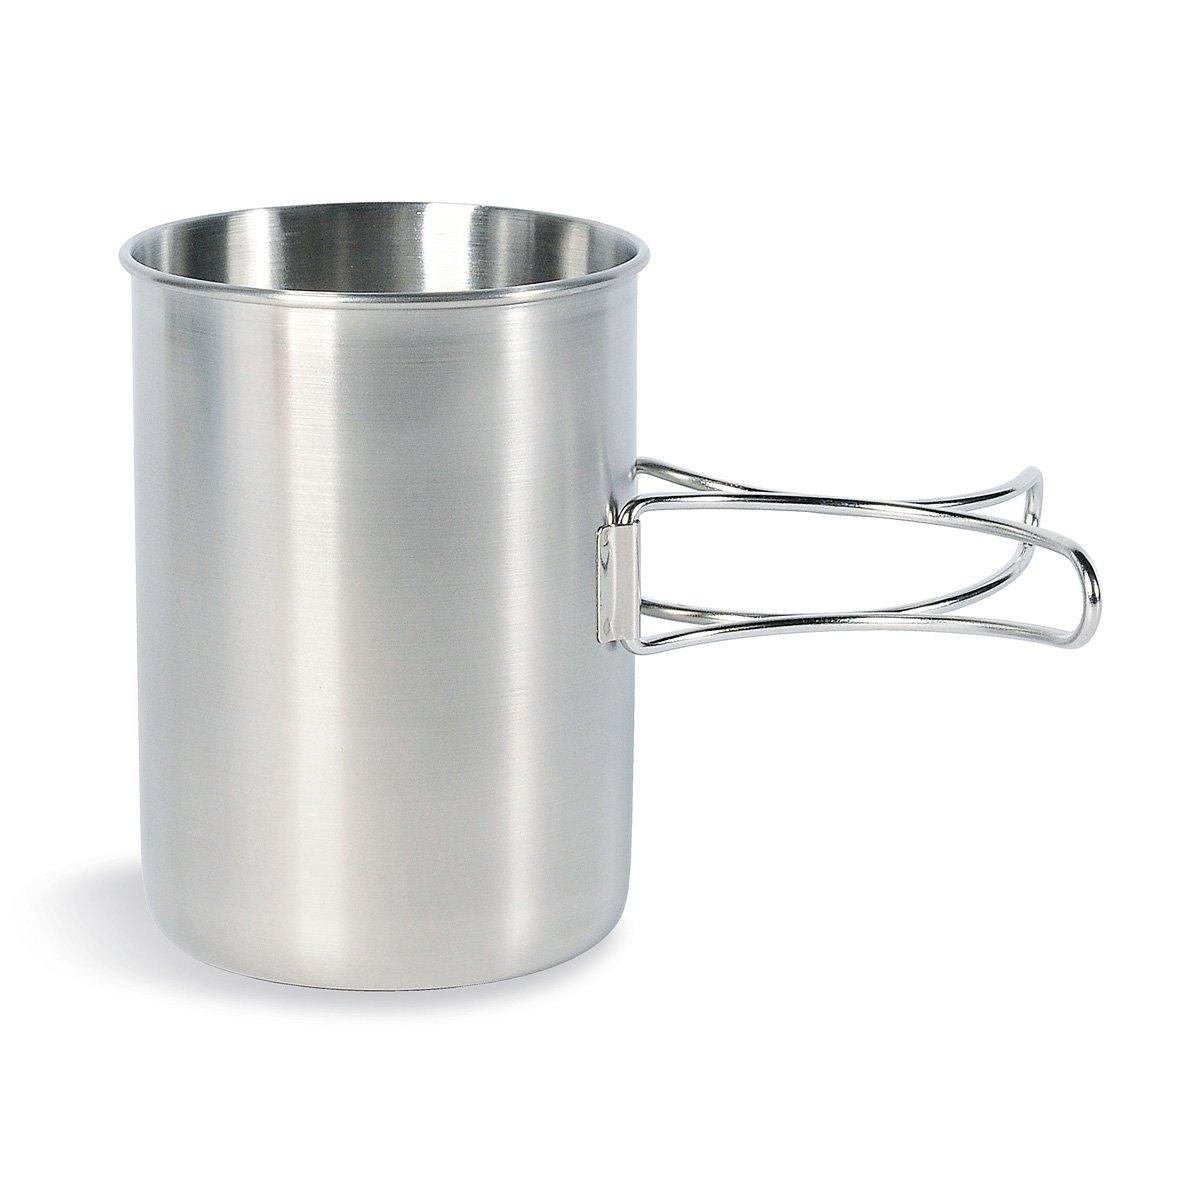 Tatonka Uni Handle Mug 850–Taza, Transparente, 10x 13,5cm TATK5|#Tatonka 4074